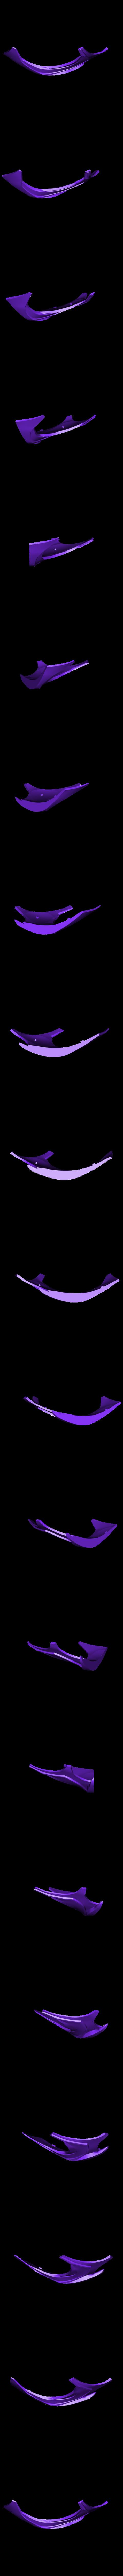 Bird_Emblem_Part_2_v2.stl Download free STL file Battlestar Galactica Colonial Viper Pilot Helmet • 3D printing object, VillainousPropShop